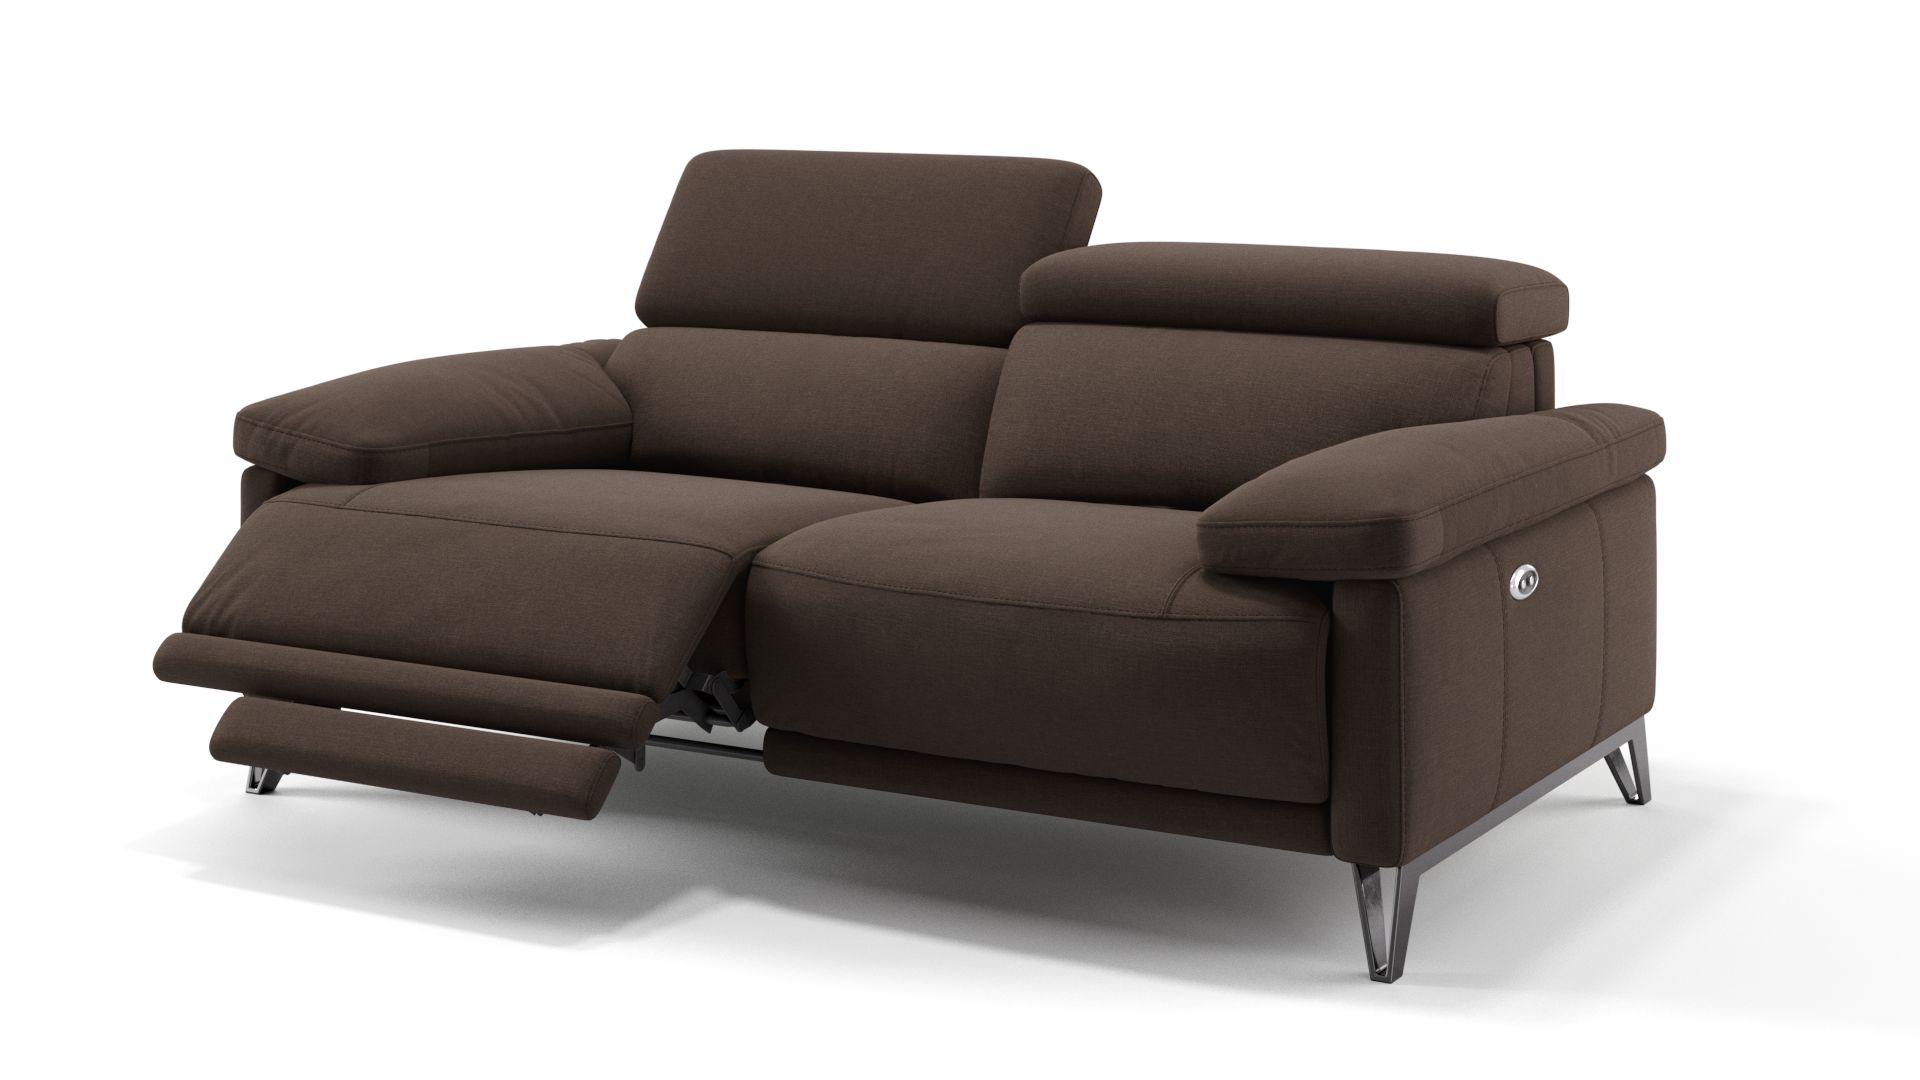 Stoff 2-Sitzer Sofa CELANO